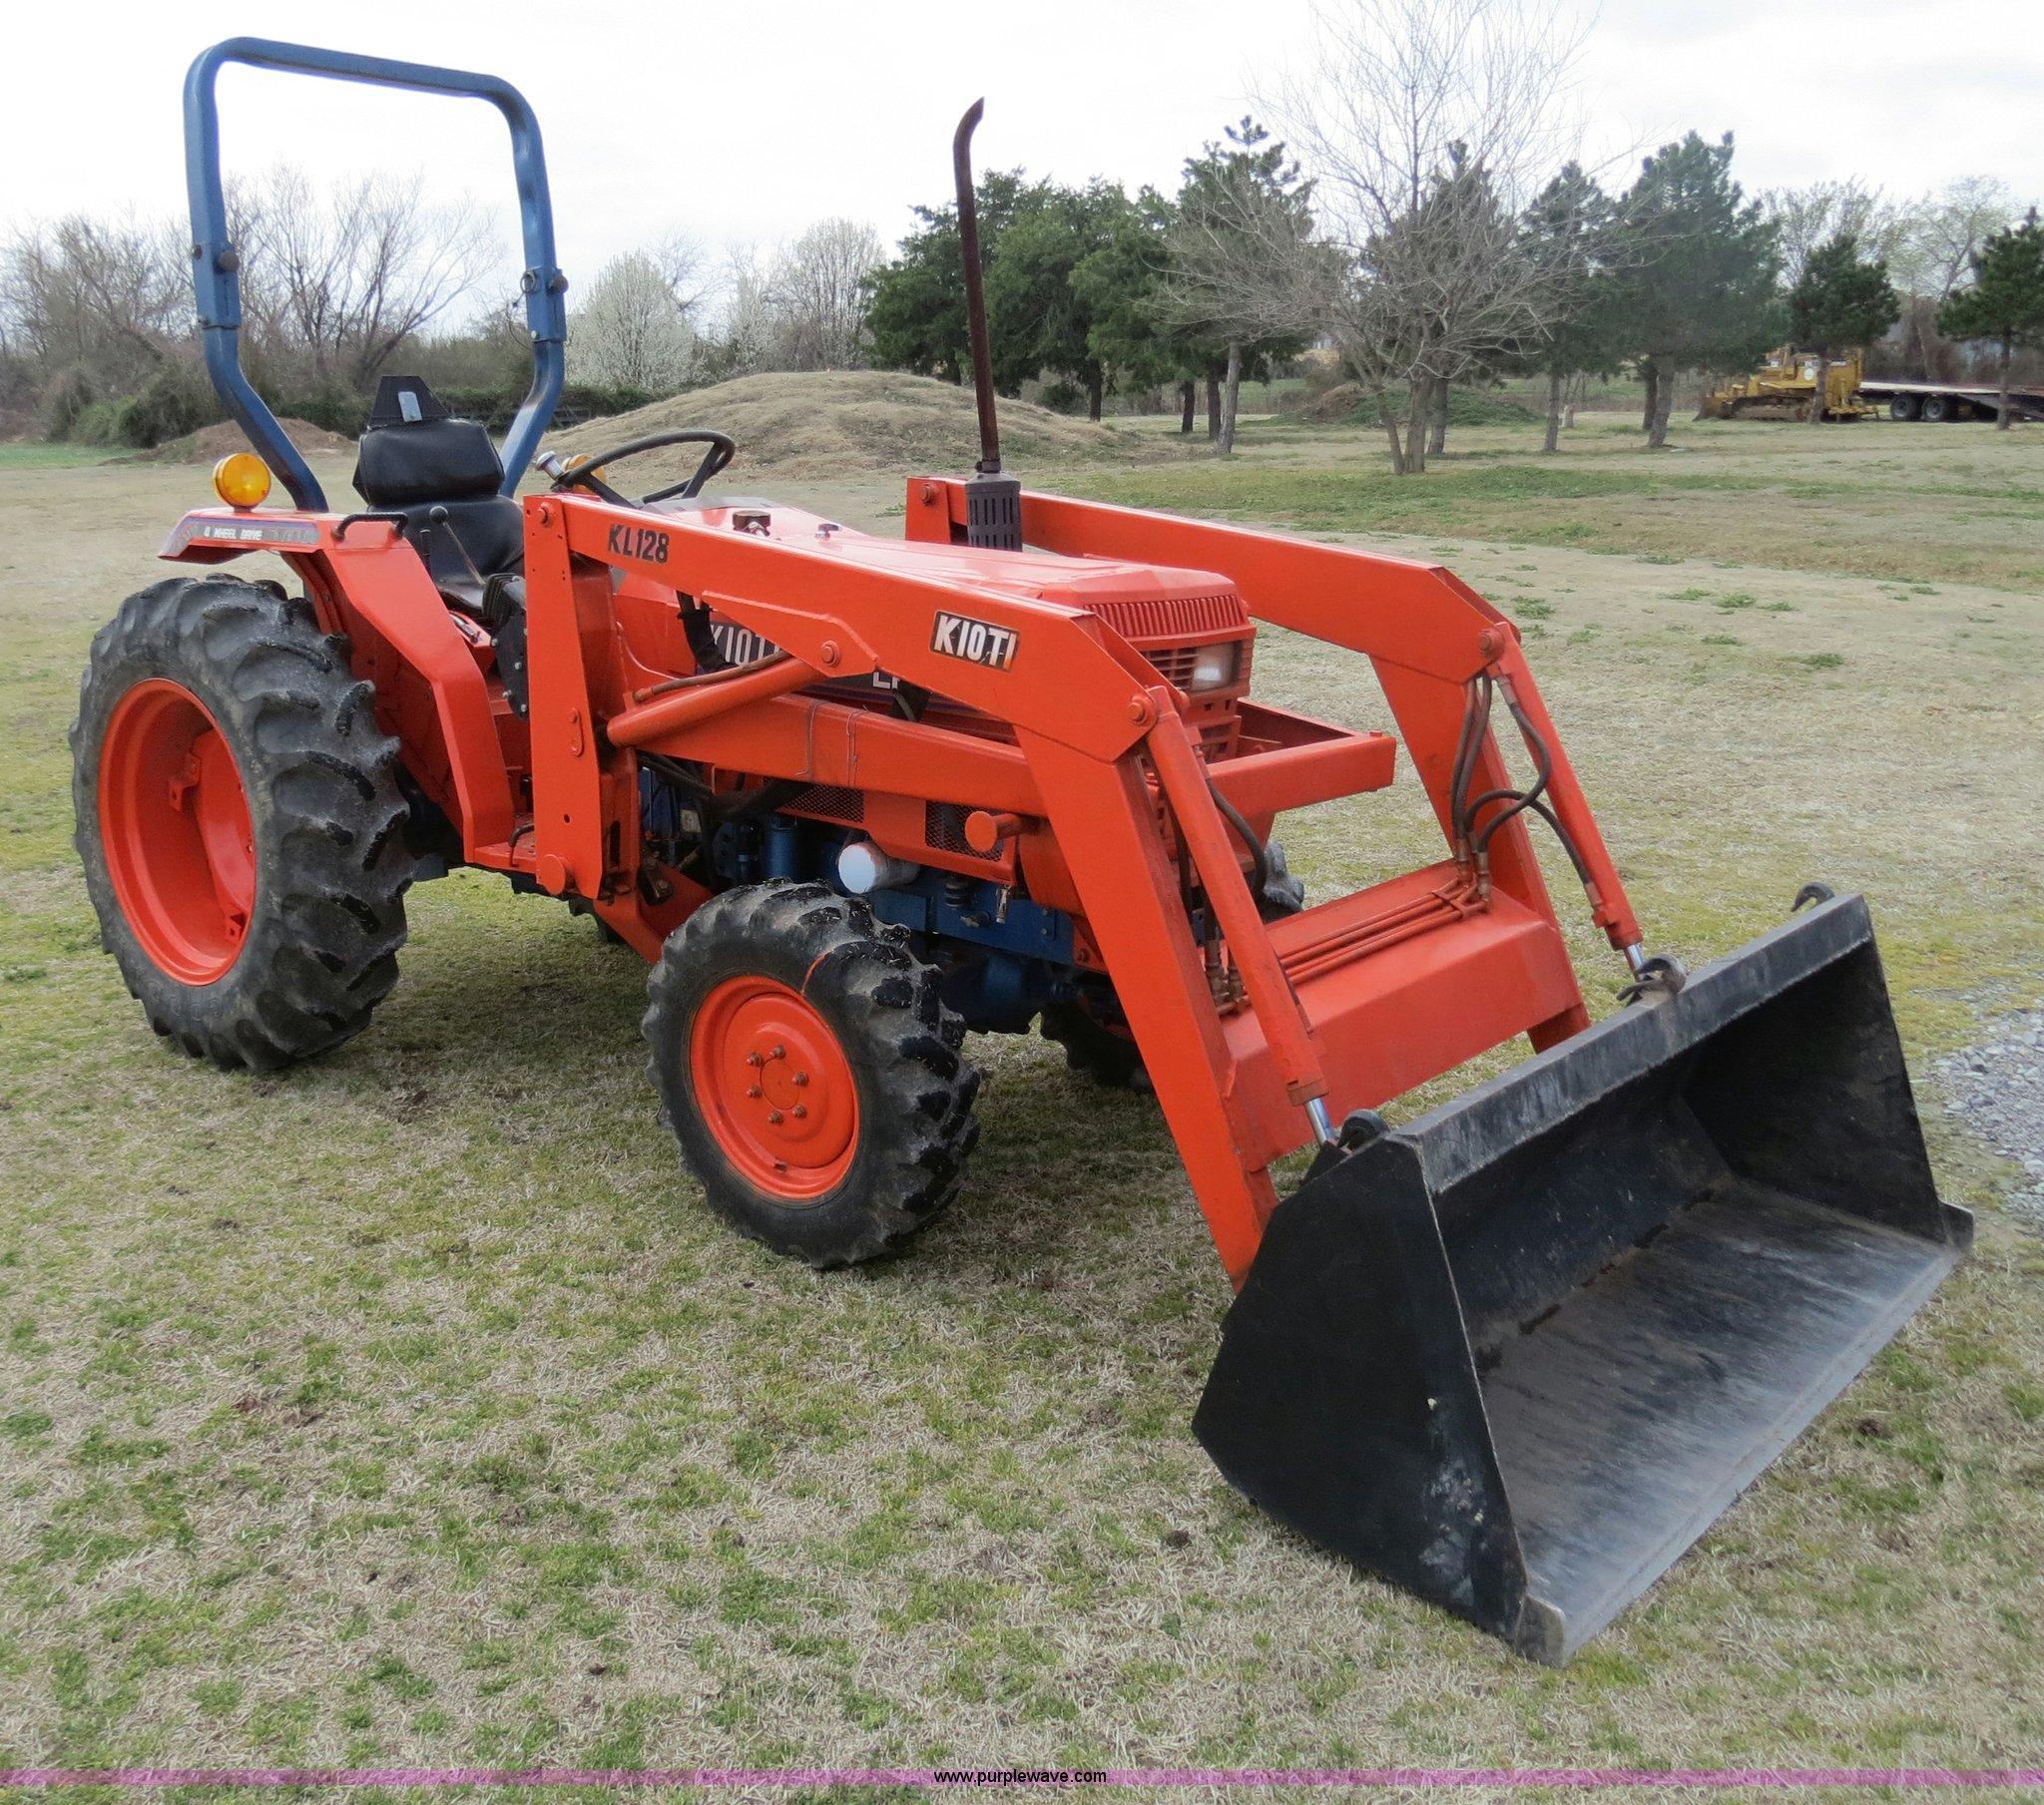 kioti tractor lk3054 owners manual ebook rh kioti tractor lk3054 owners manual ebook spir Kioti Tractor Parts Breakdown Kioti Parts Online